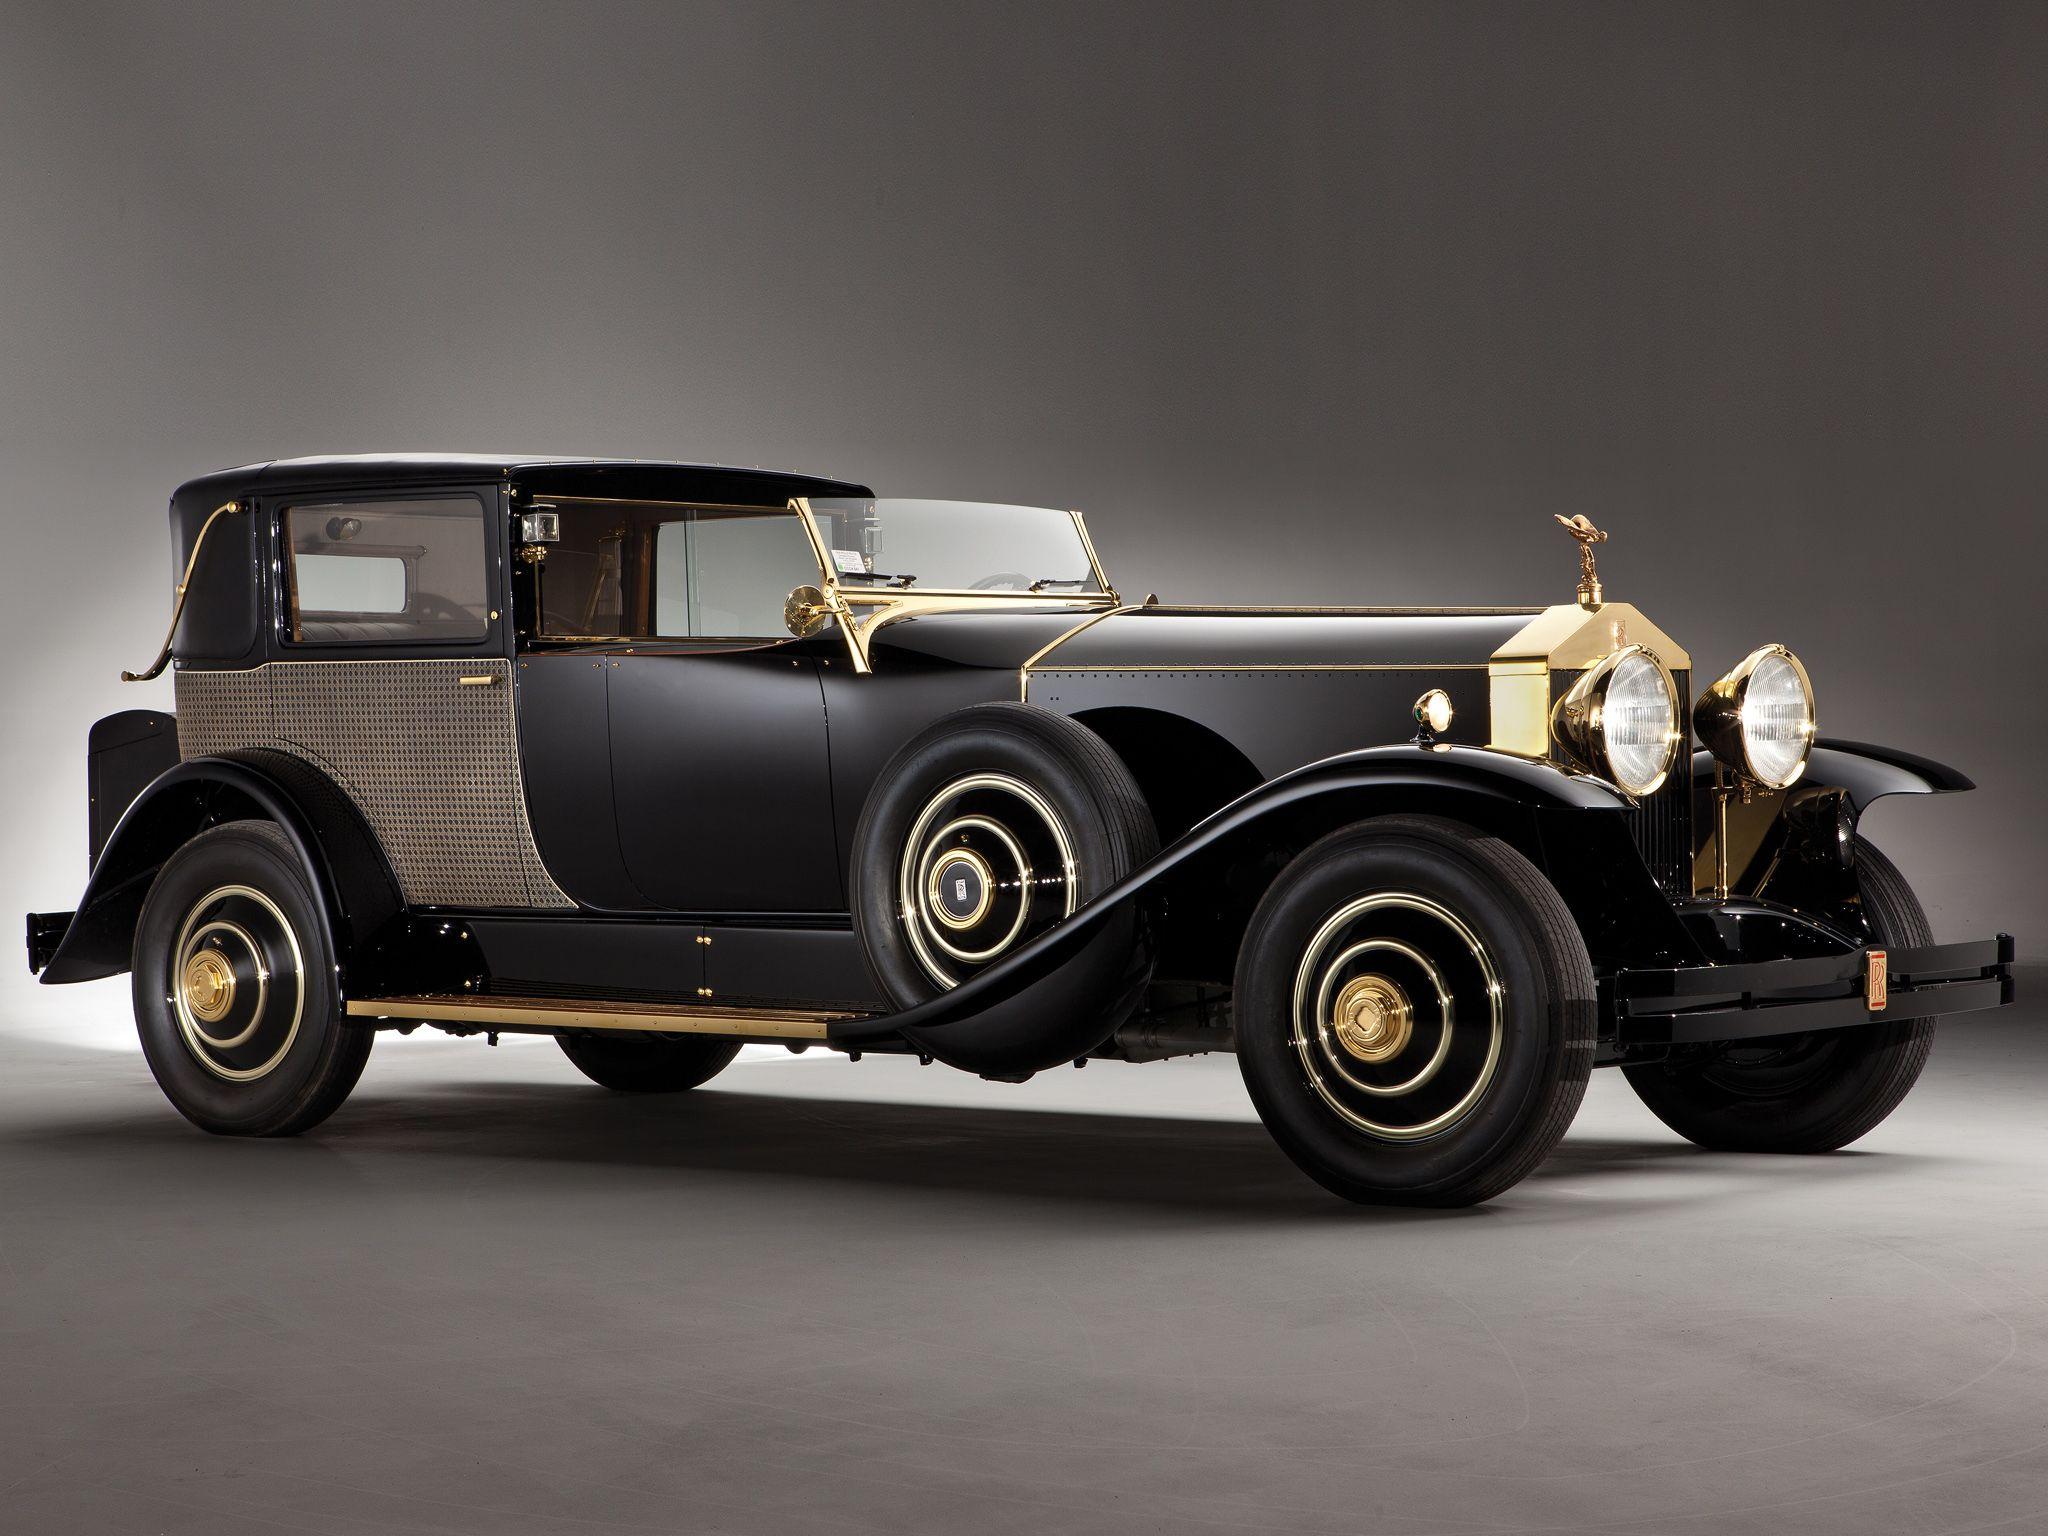 1929 Rolls Royce Phantom Riviera Town Brougham By Brewster Opulenza Rolls Royce Phantom Rolls Royce Classic Cars